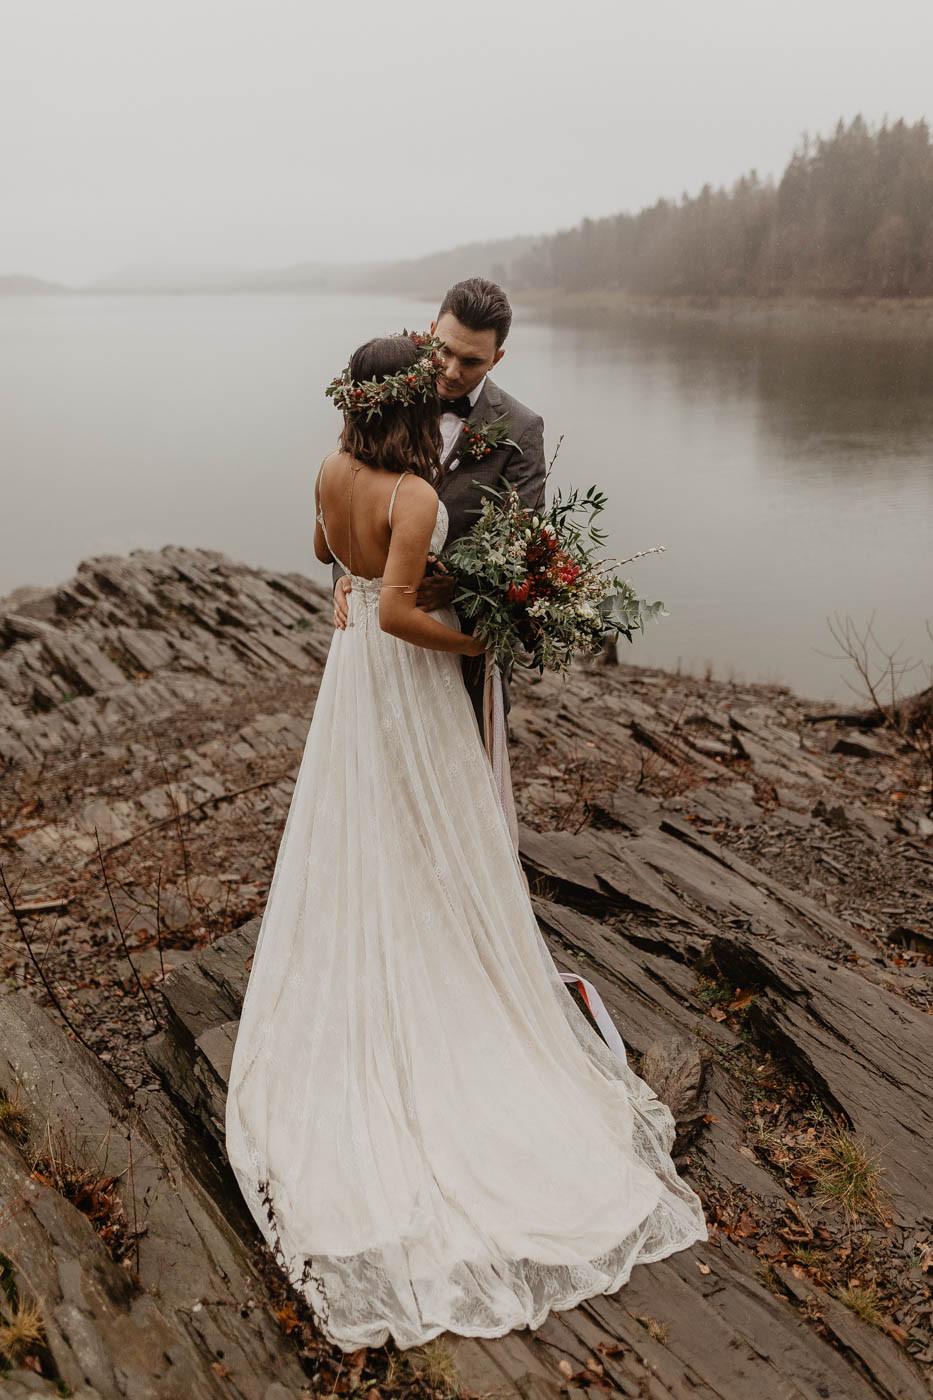 Wedding Photographer & Videographer Switzerland